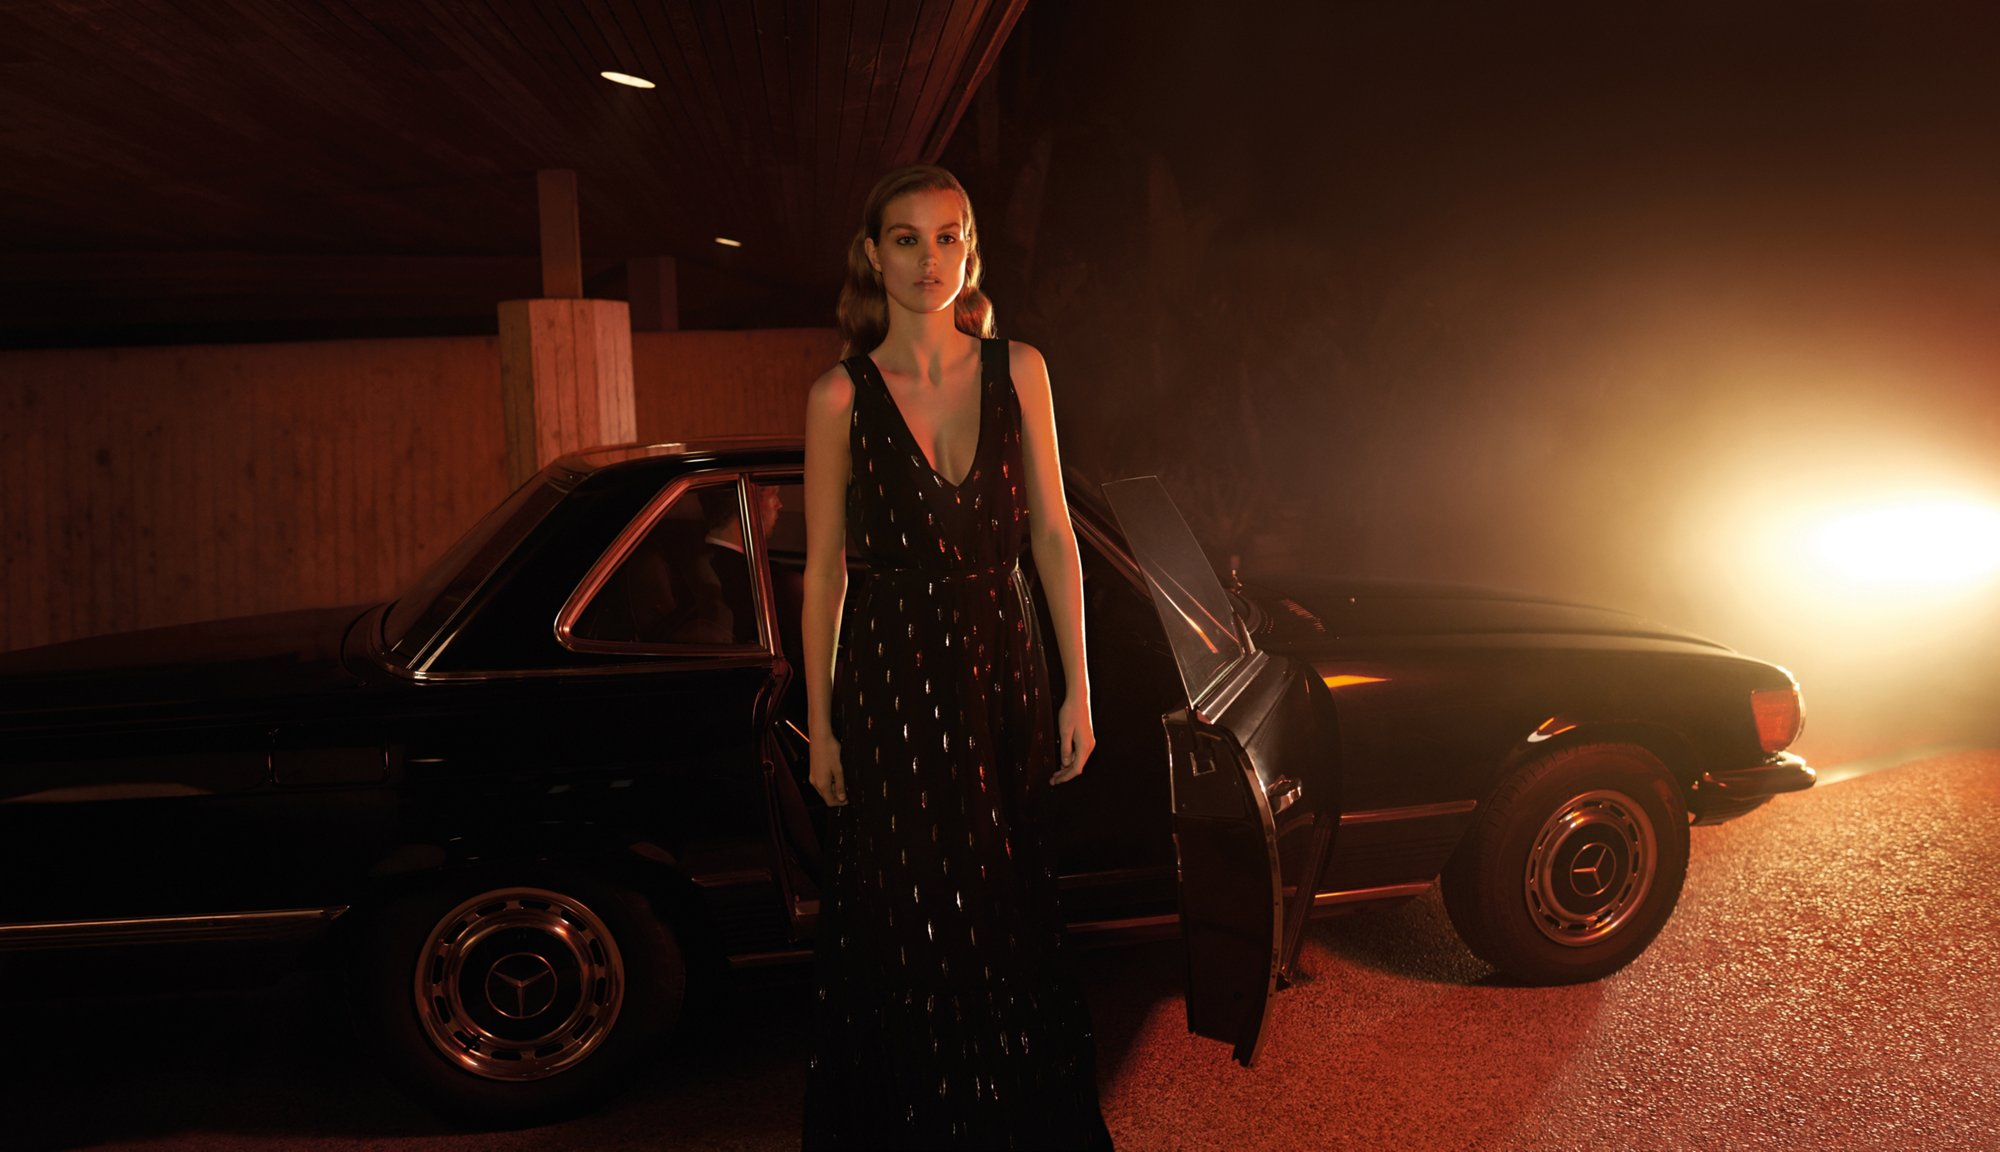 BOSS全新节日系列助您点亮假日季,为晚礼服造型赋予全新阐释。夜幕降临,换上一件黑色的轰炸机式夹克,穿上运动风格的服装,或者搭配一条层层叠错的薄纱修身长裙。作为年度大型盛典的夜晚造型,再适合不过了